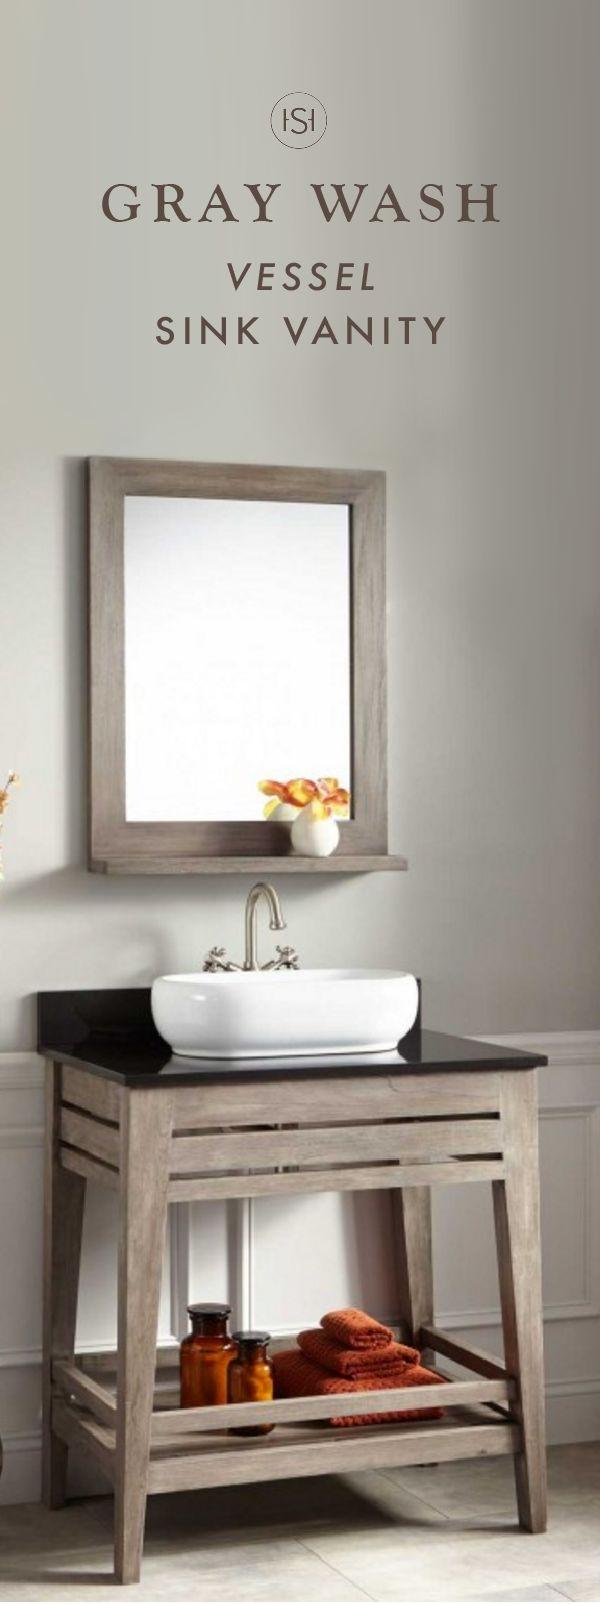 Bathroom Makeovers Wa 13 best shelter island images on pinterest | room, bathroom ideas